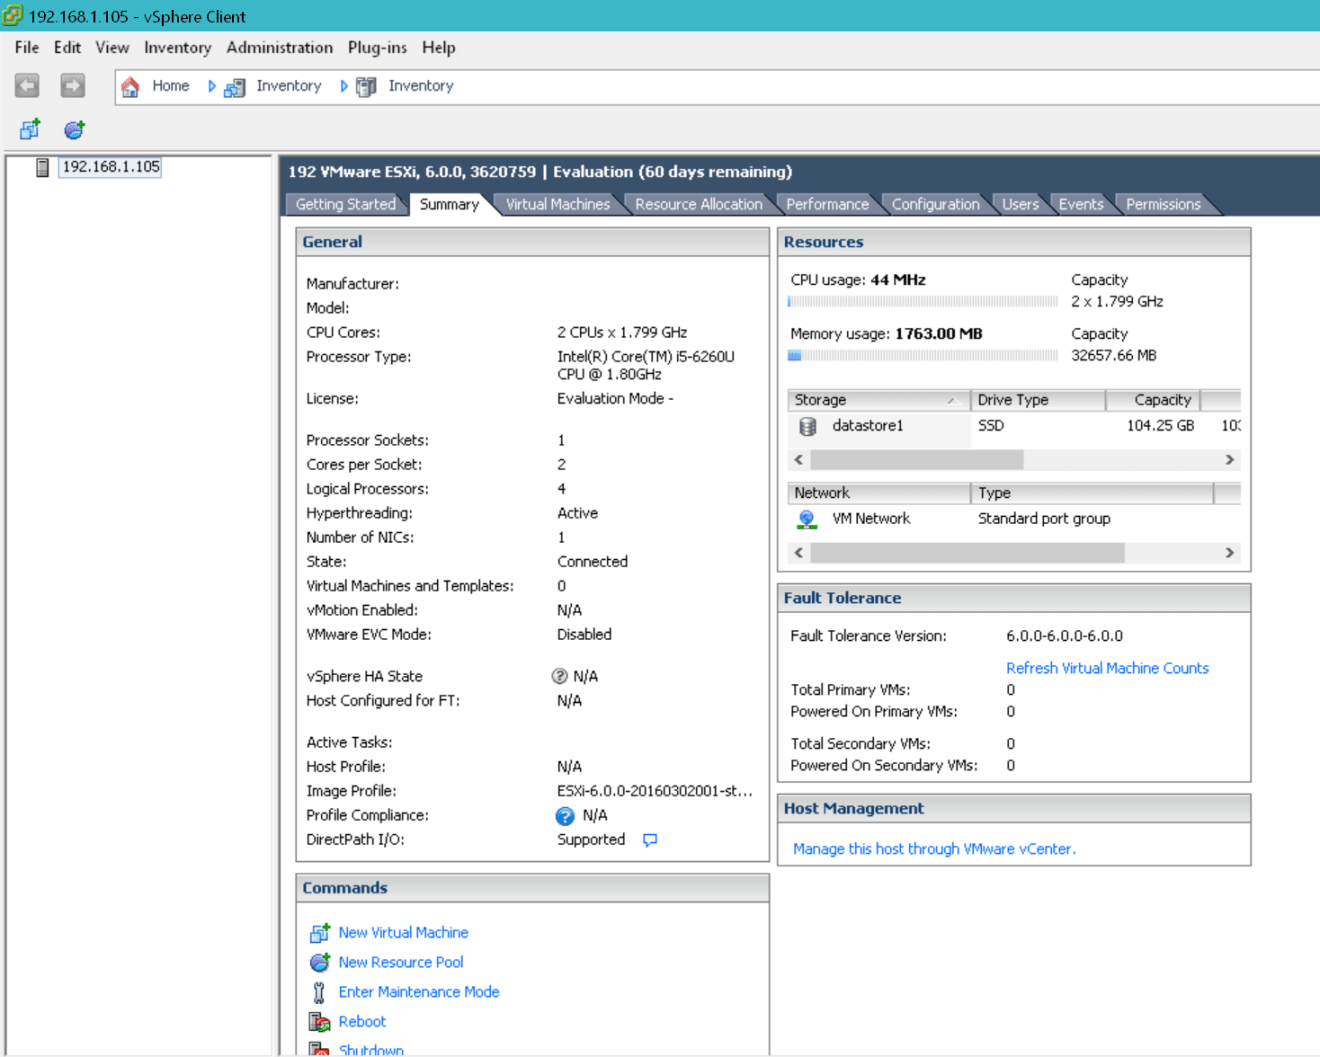 domalab.com Intel NUC ESXi configuration first time